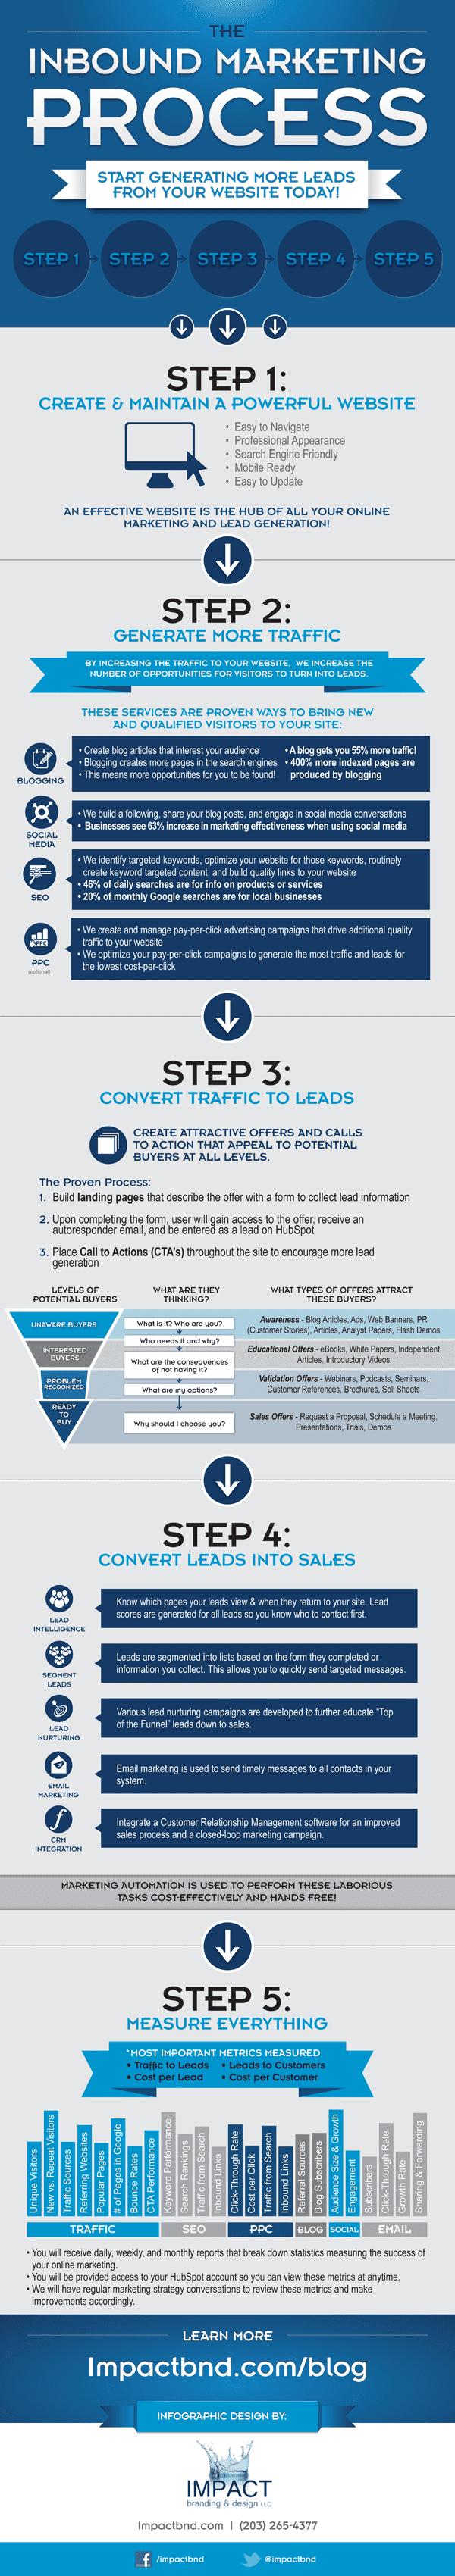 Inboundmarketing in 6 stappen - van strategie tot analyse